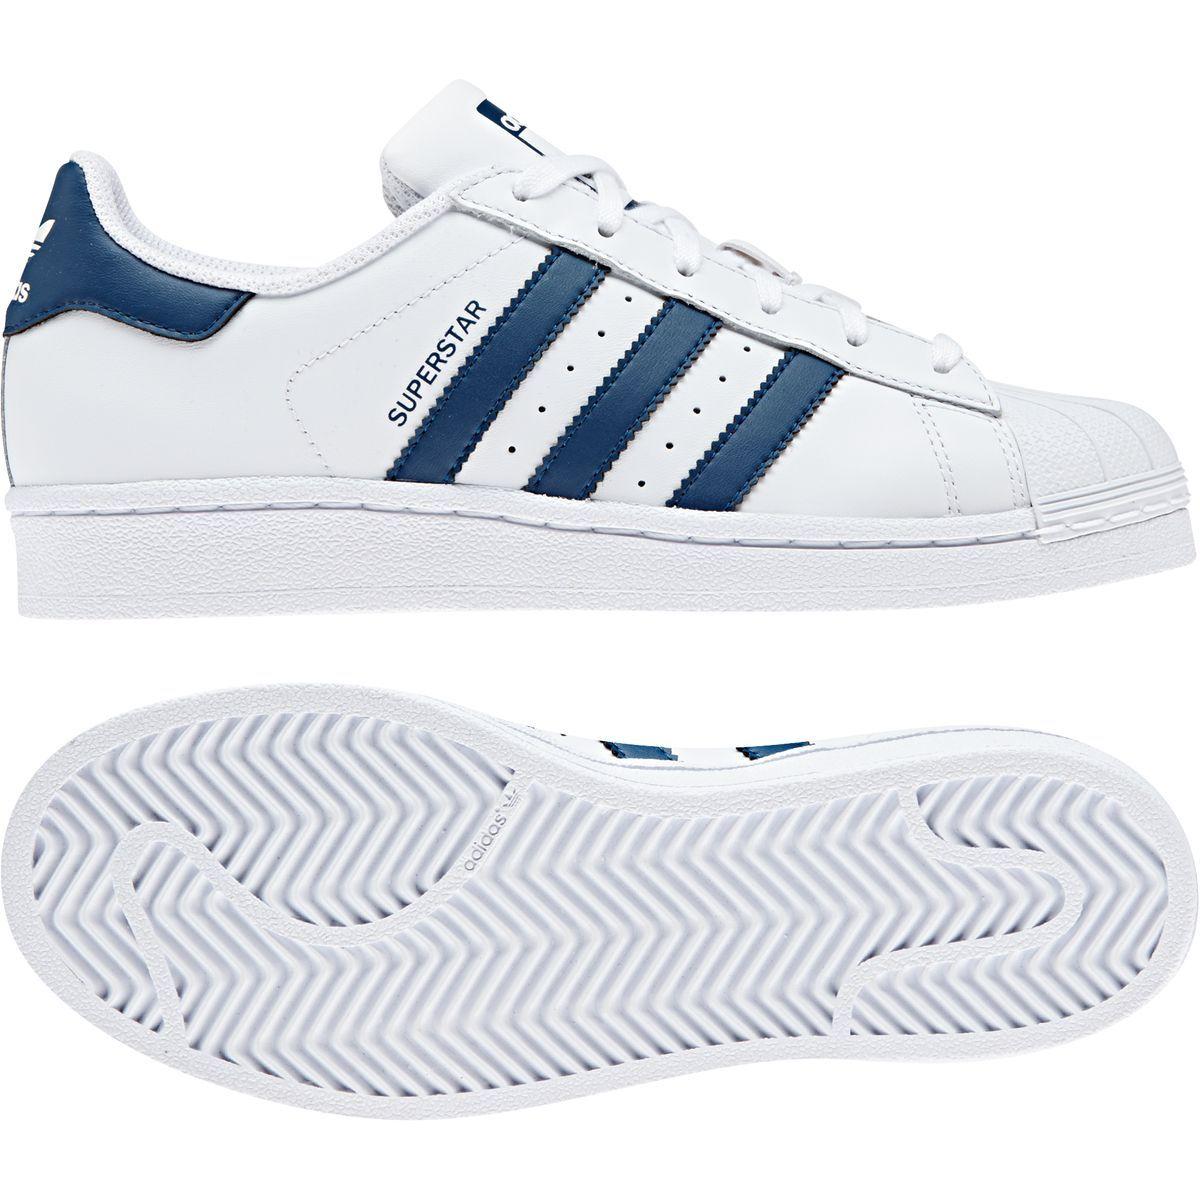 Chaussures Superstar - Taille : 35 1/2 | Chaussure adidas ...